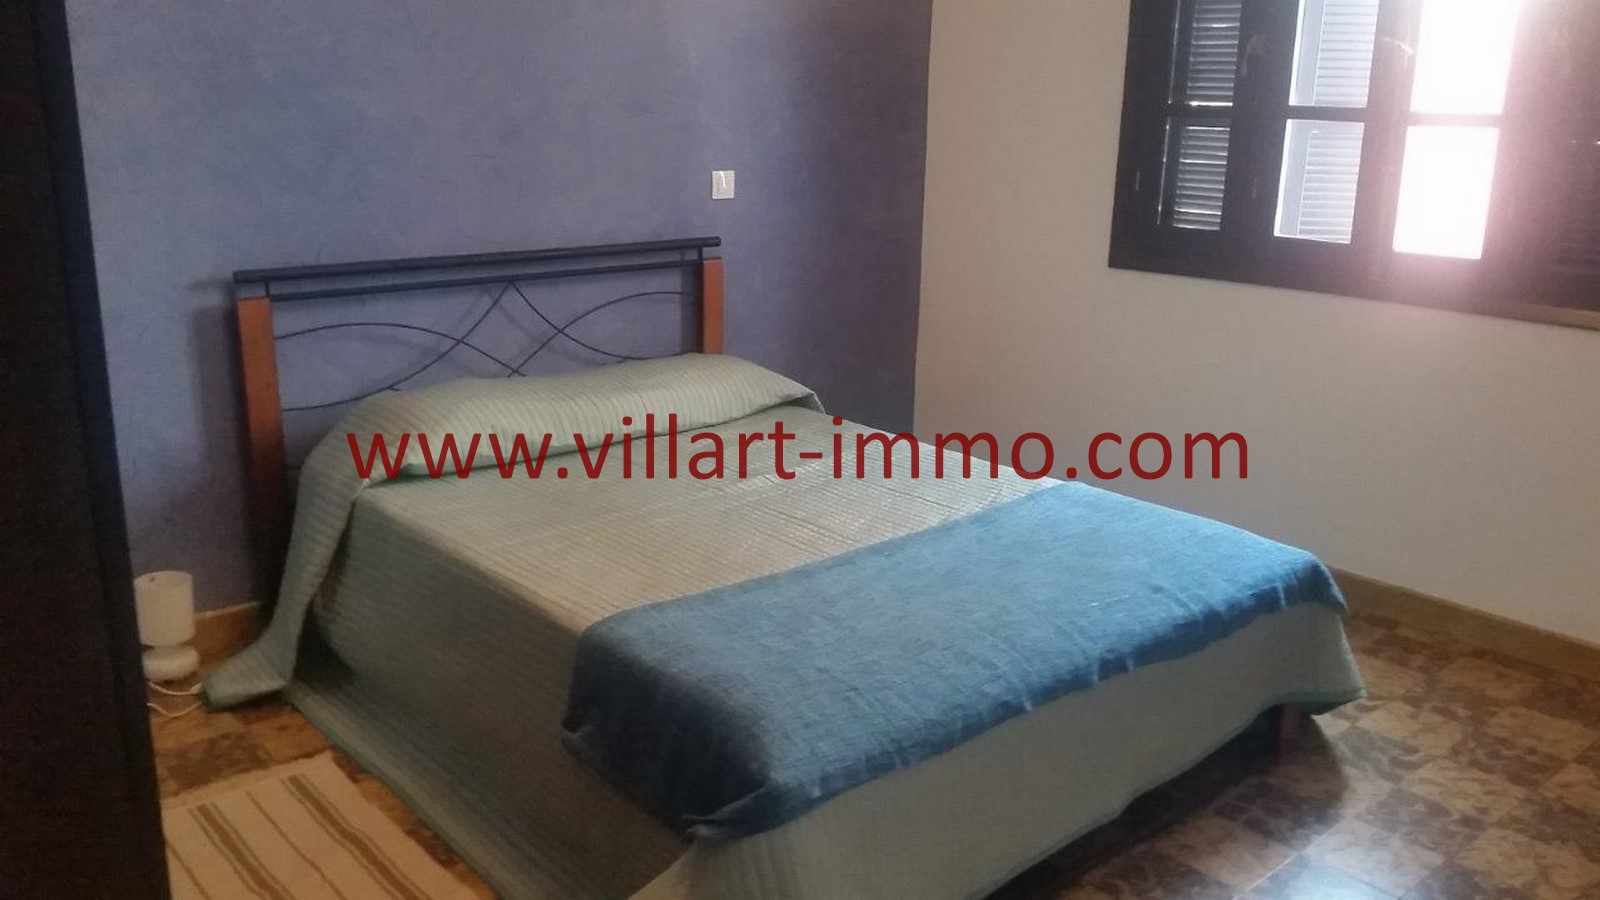 9-location-appartement-meuble-centre-ville-tanger-chambre-2-l965-villart-immo